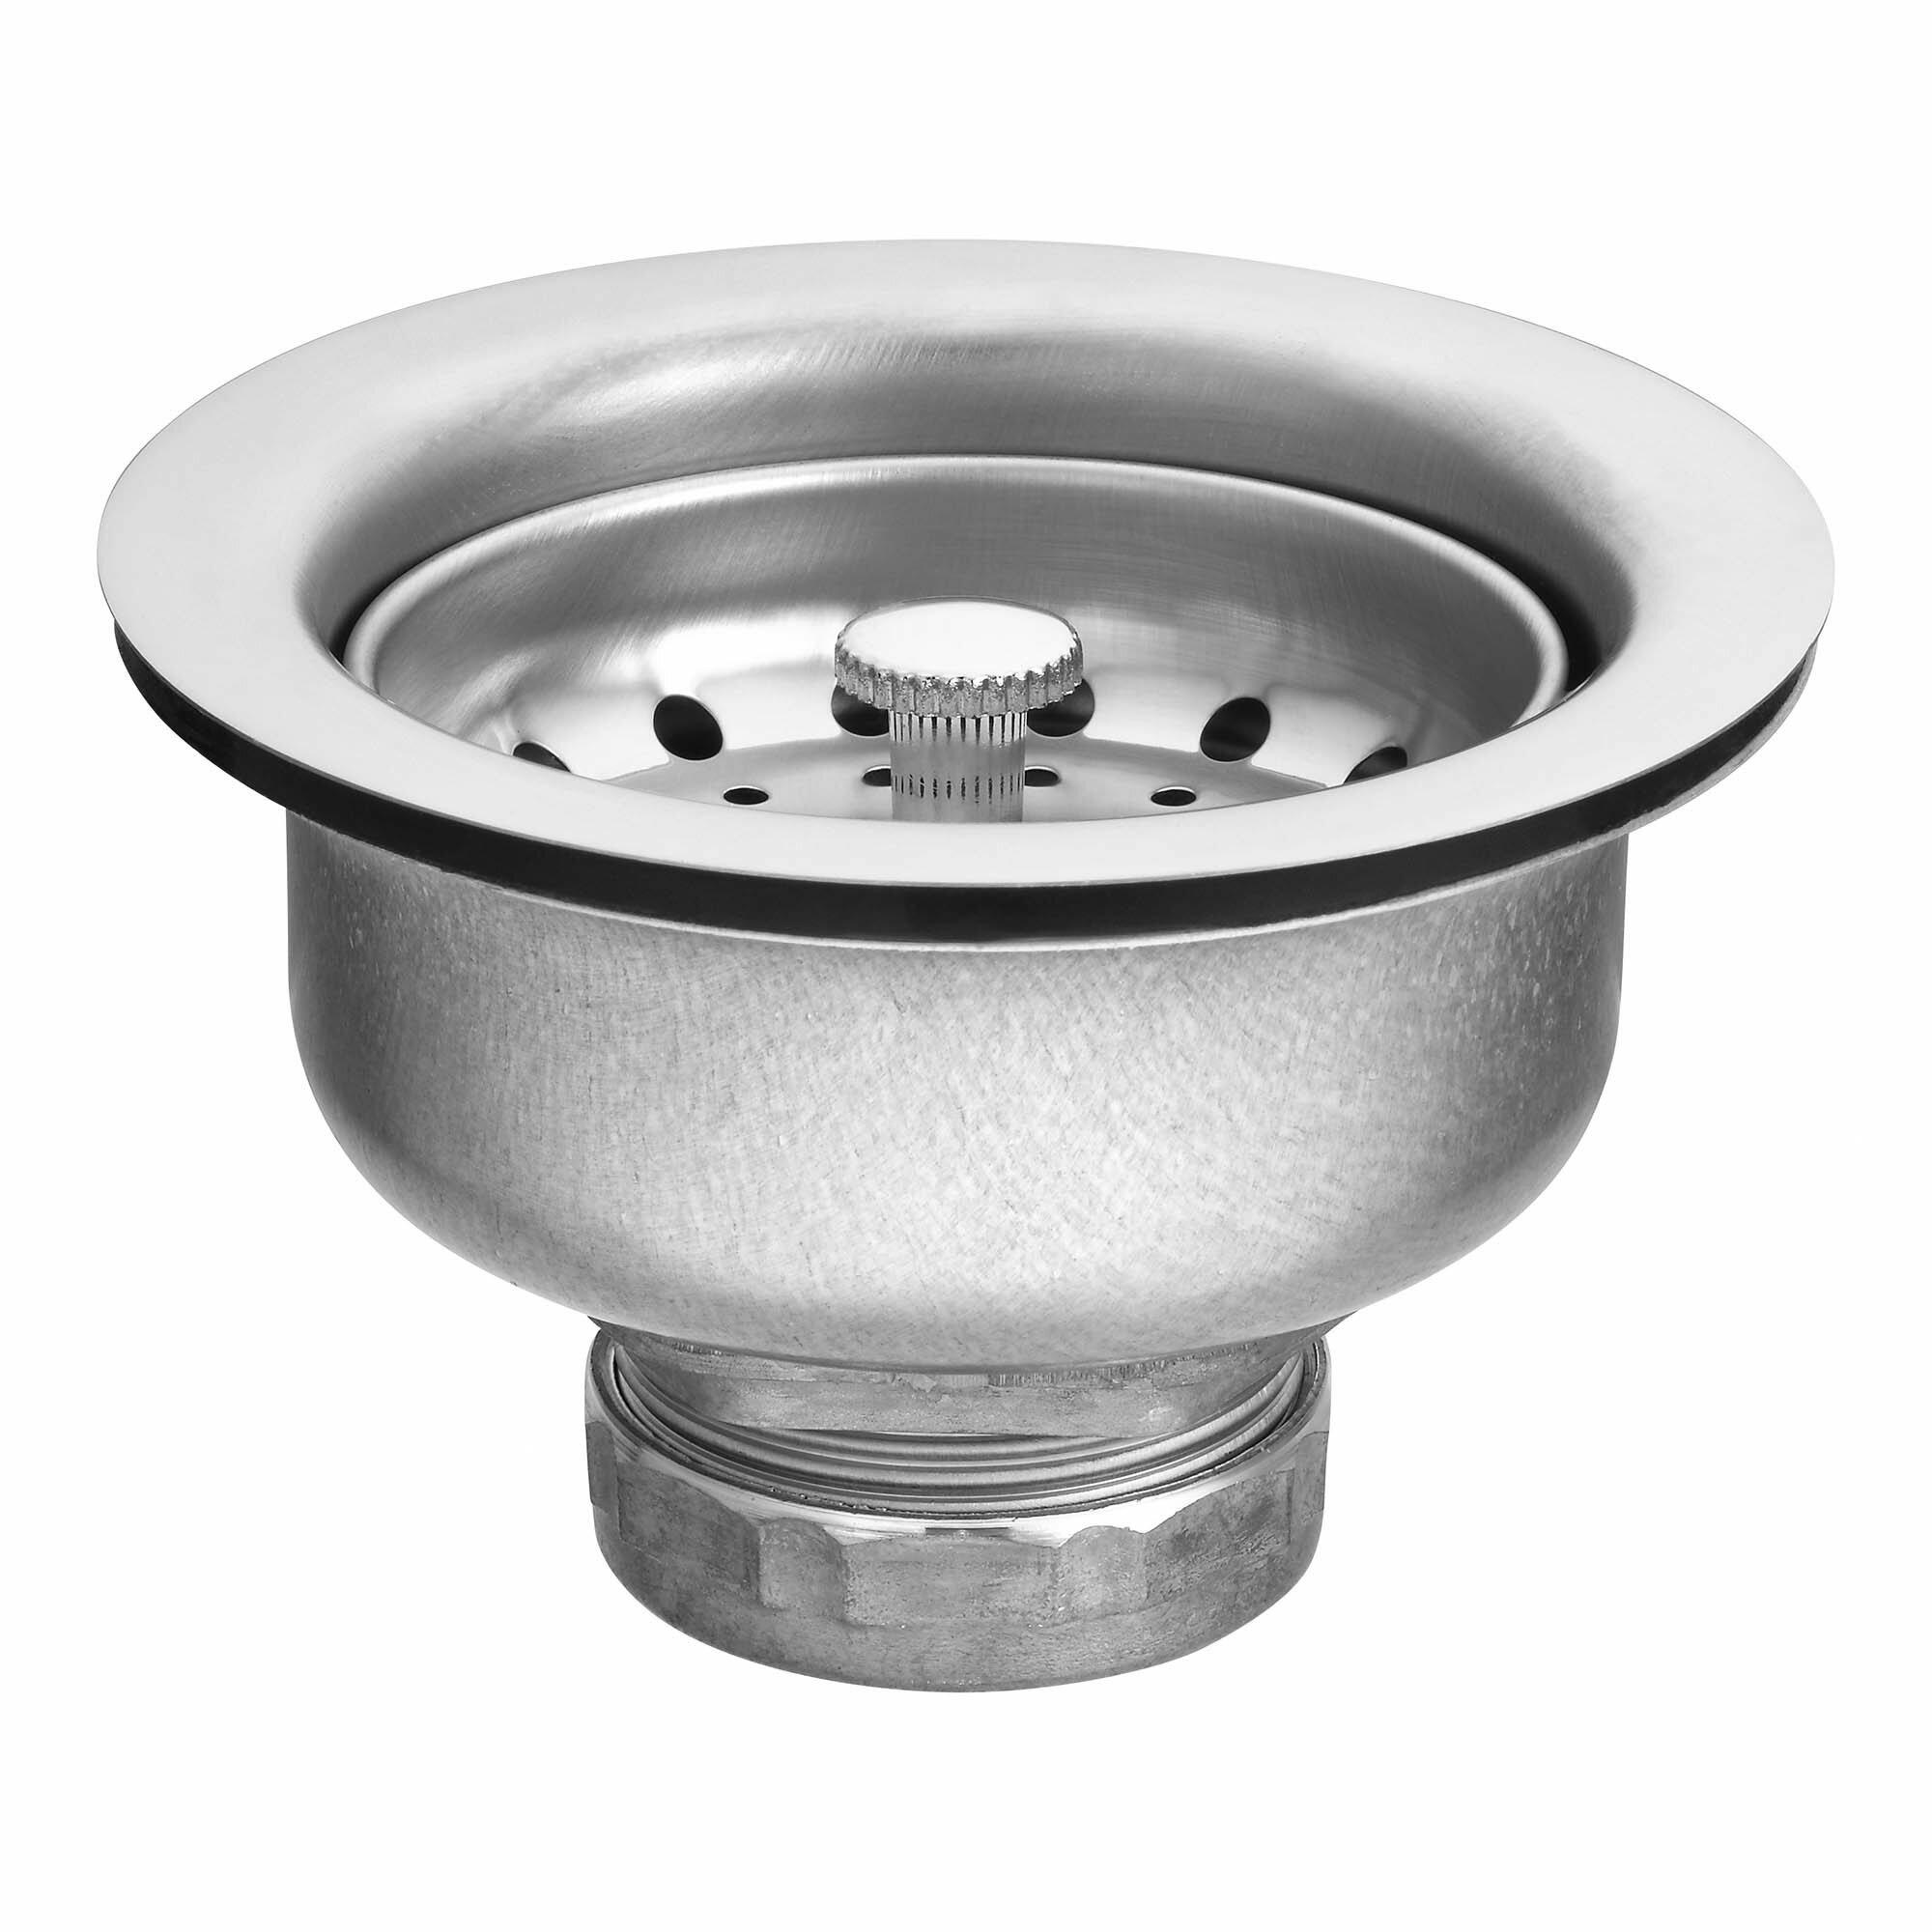 Moen moen basket strainer kitchen sink drain reviews wayfair